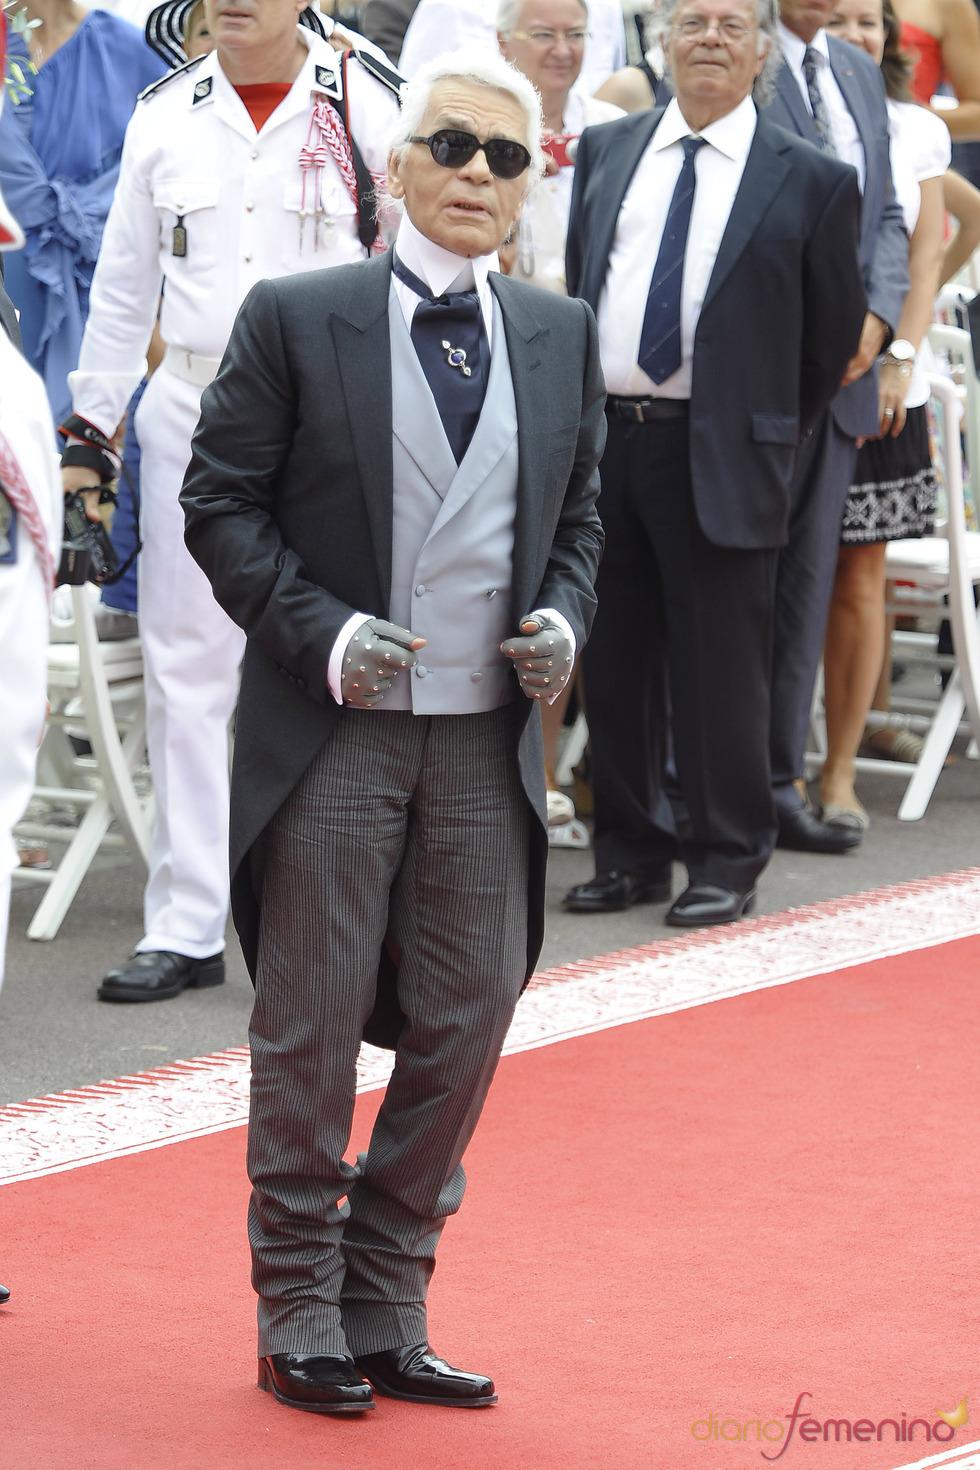 Karl Lagerfeld llega a la ceremonia religiosa de la Boda Real de Mónaco